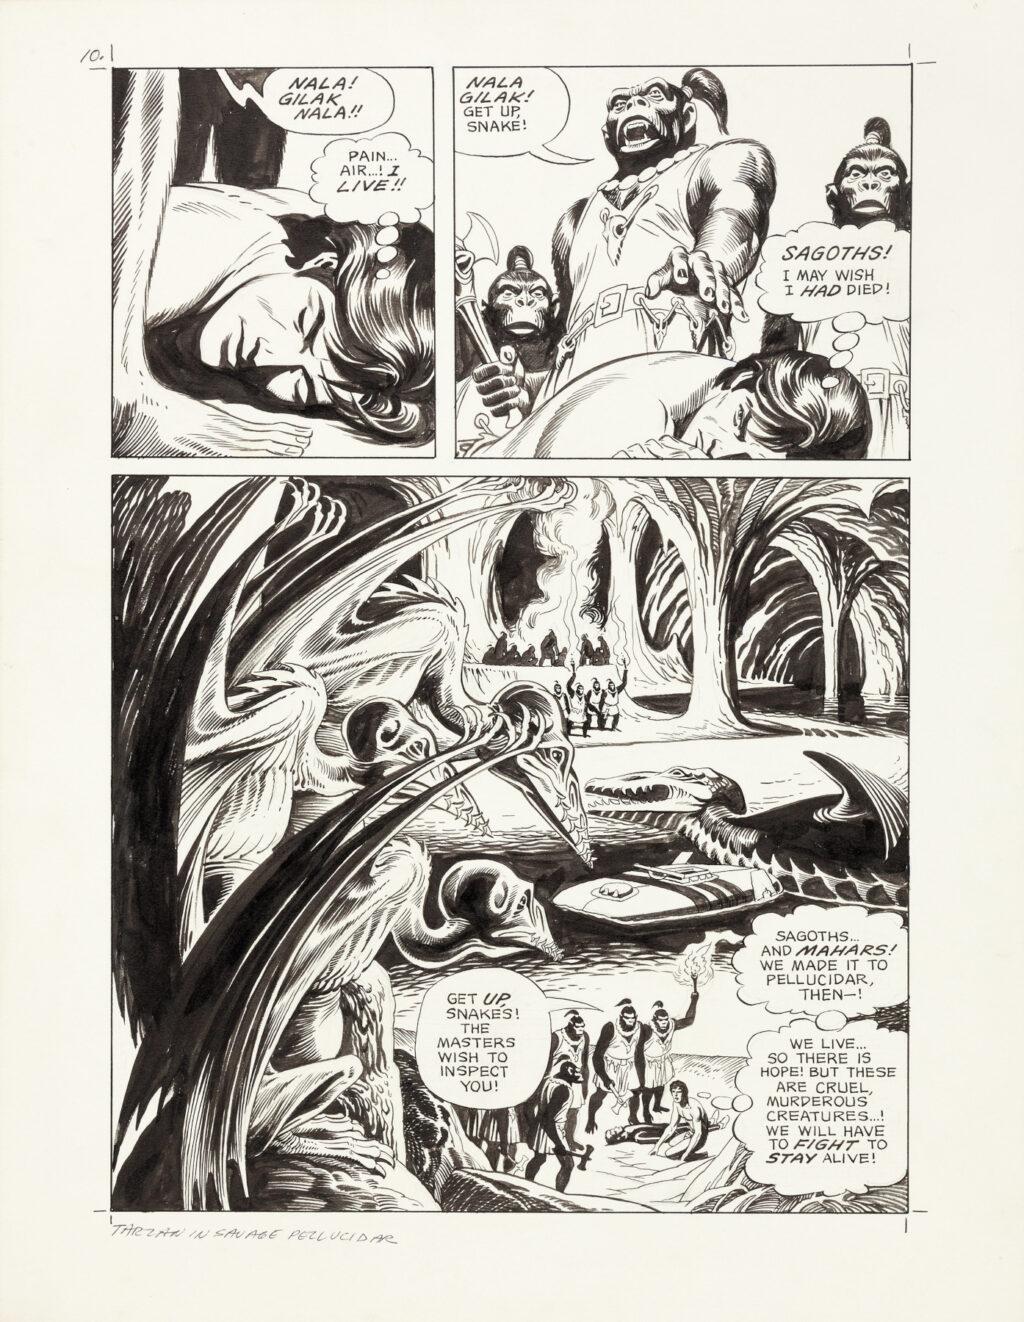 Tarzan in Savage Pellucidar page 10 by Russ Manning